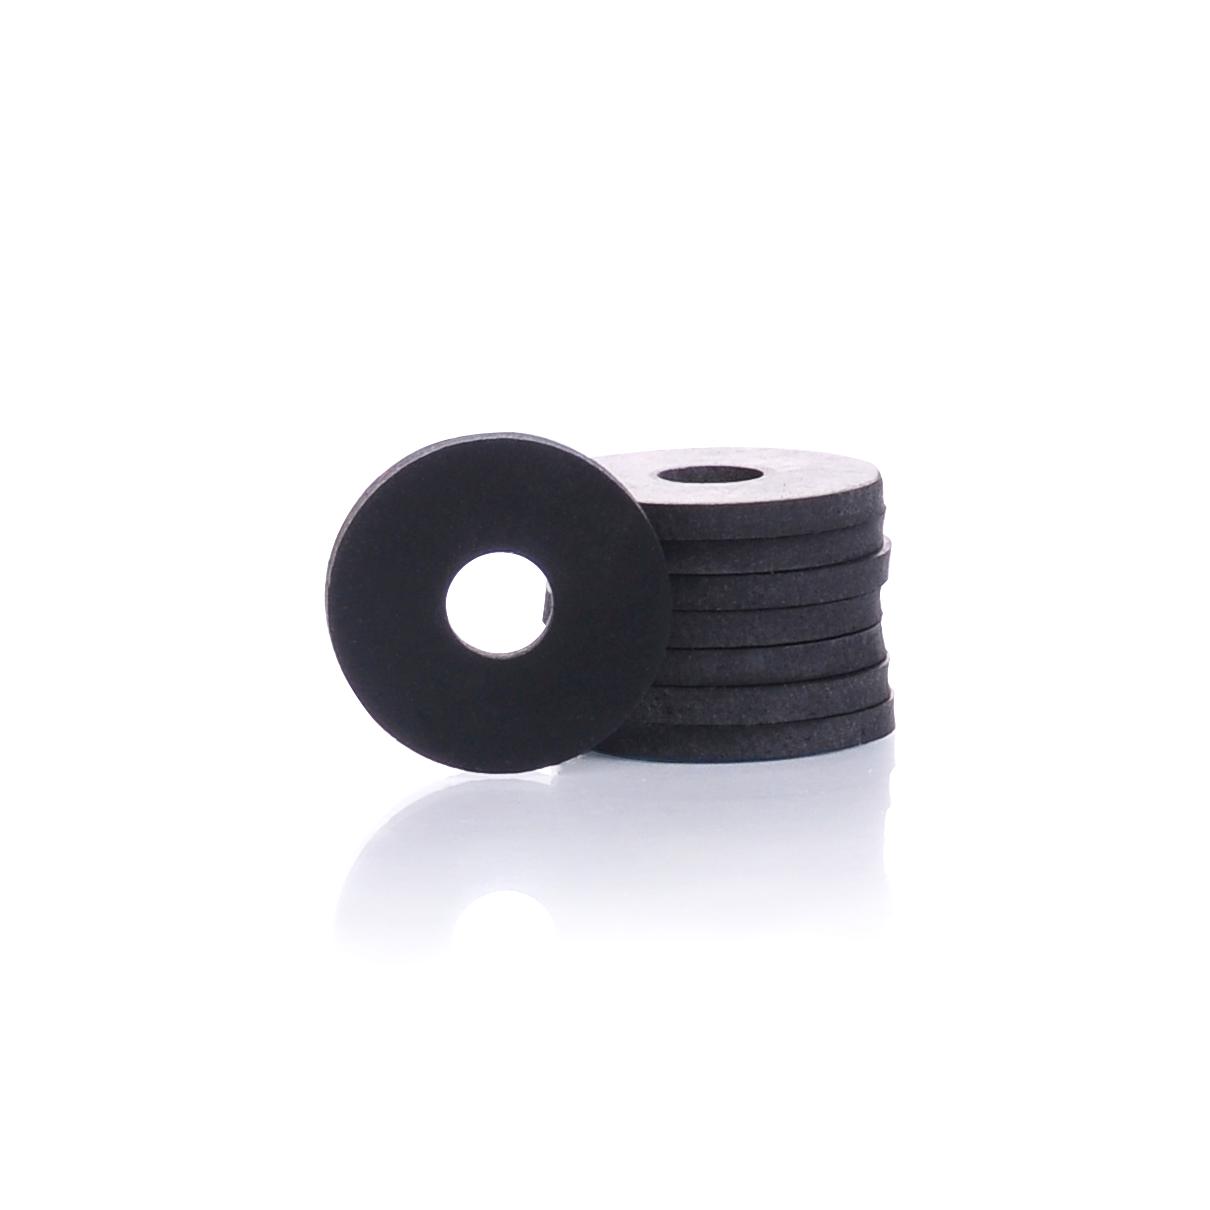 KIMBLE® KONTES® Cuvette Tube Washer For Utility Washer